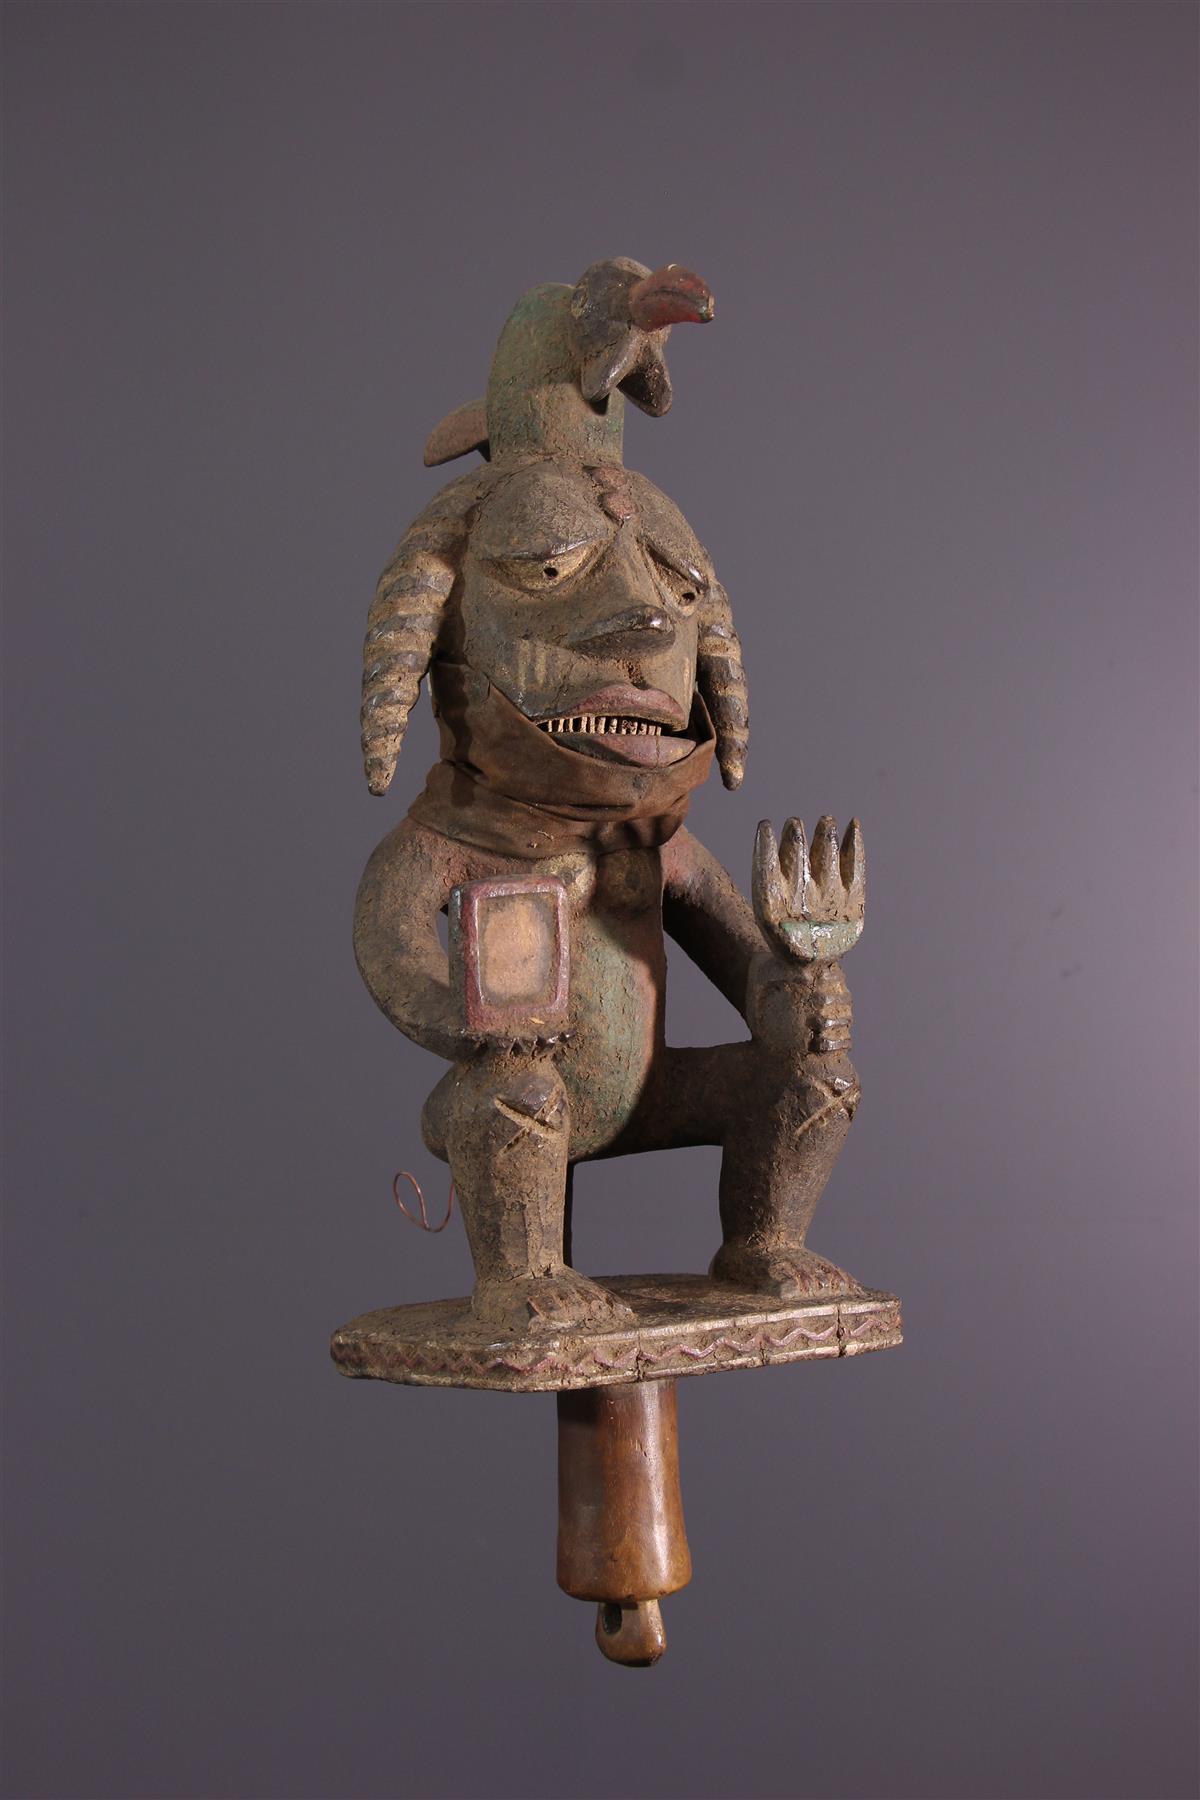 Marionnette Ibibio - Art africain